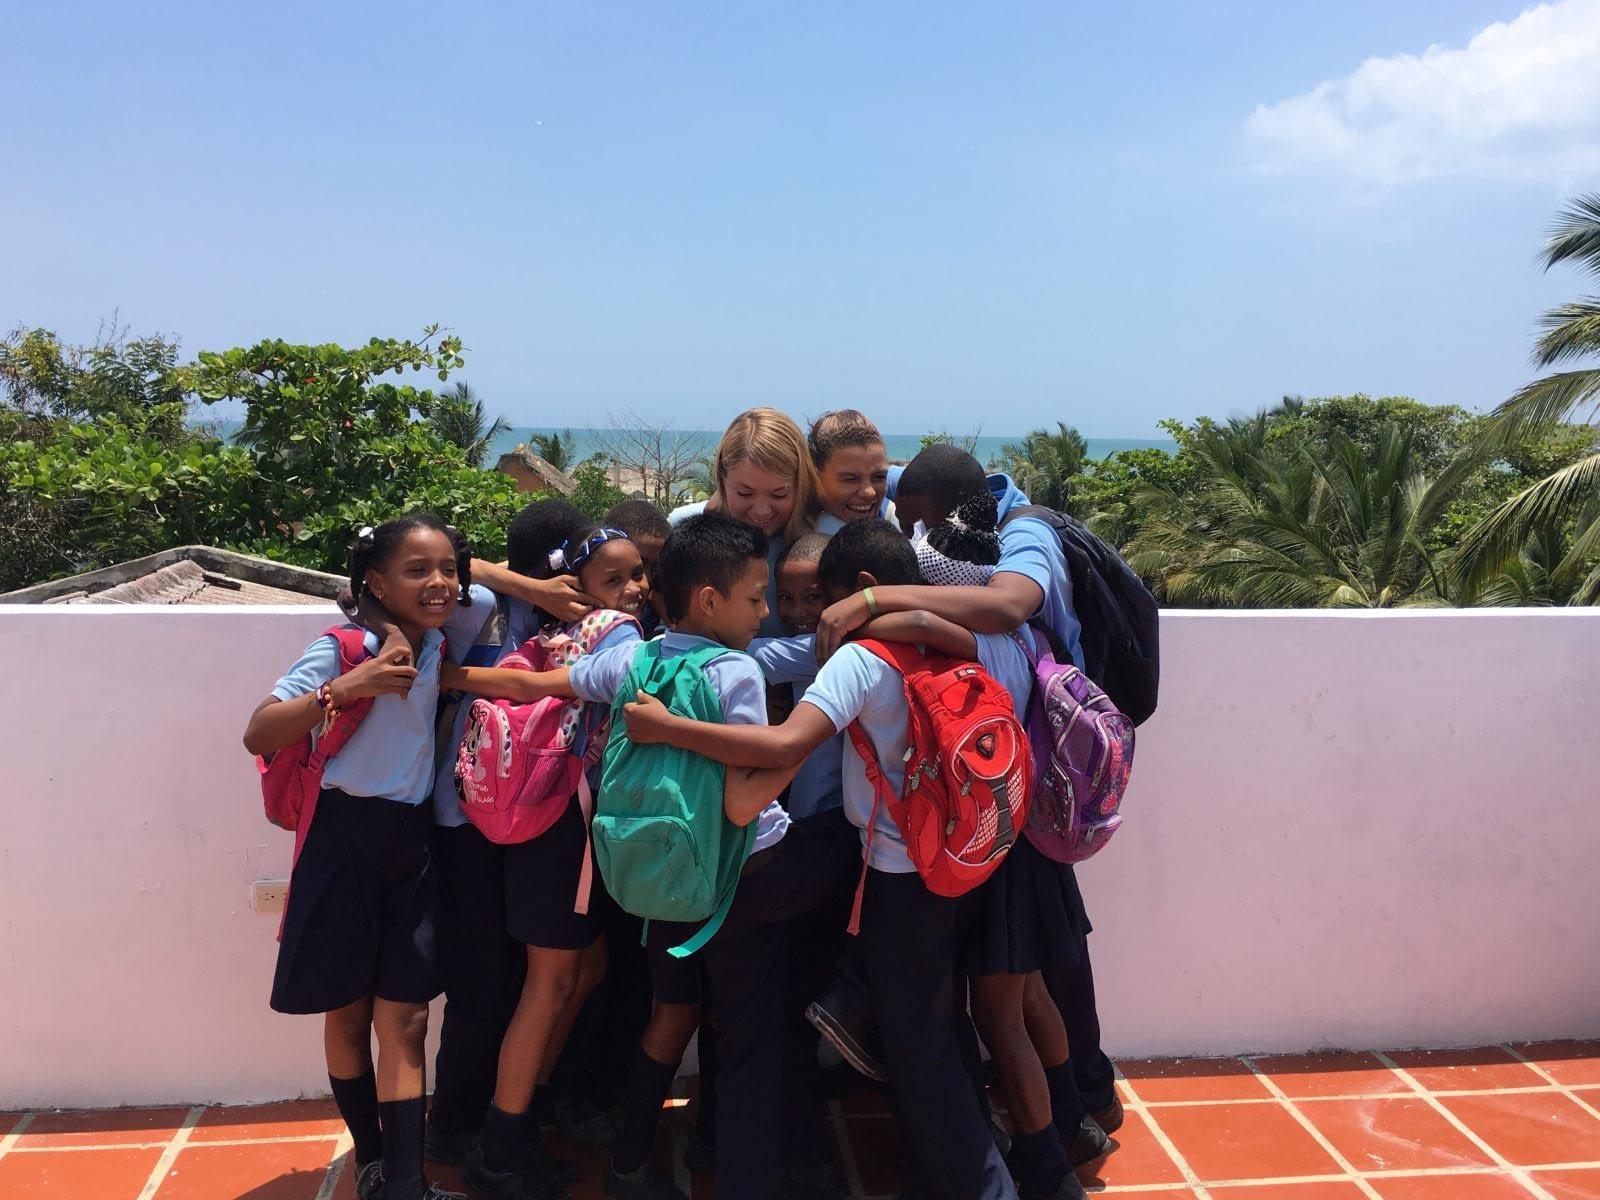 Emilia and group hug with kids 5th grade